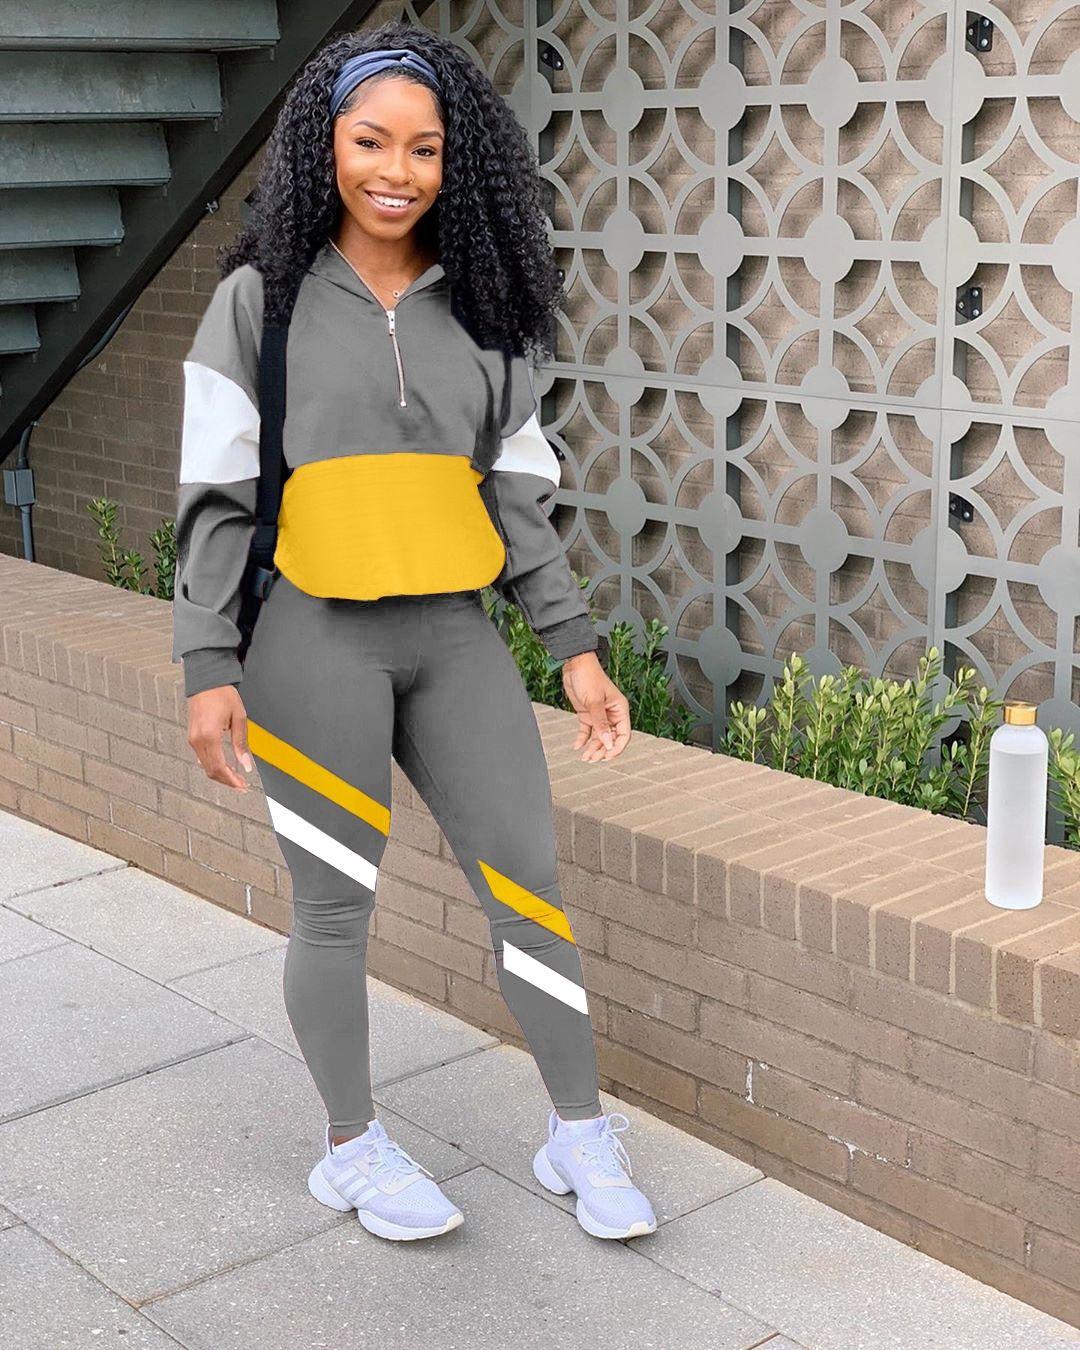 7Yu2 outfits panelled contrast Tracksuit 2 pcs Set Long Sleeve leggings tops+pants crop Sportswear Autumn winter Women fashion jacket pants